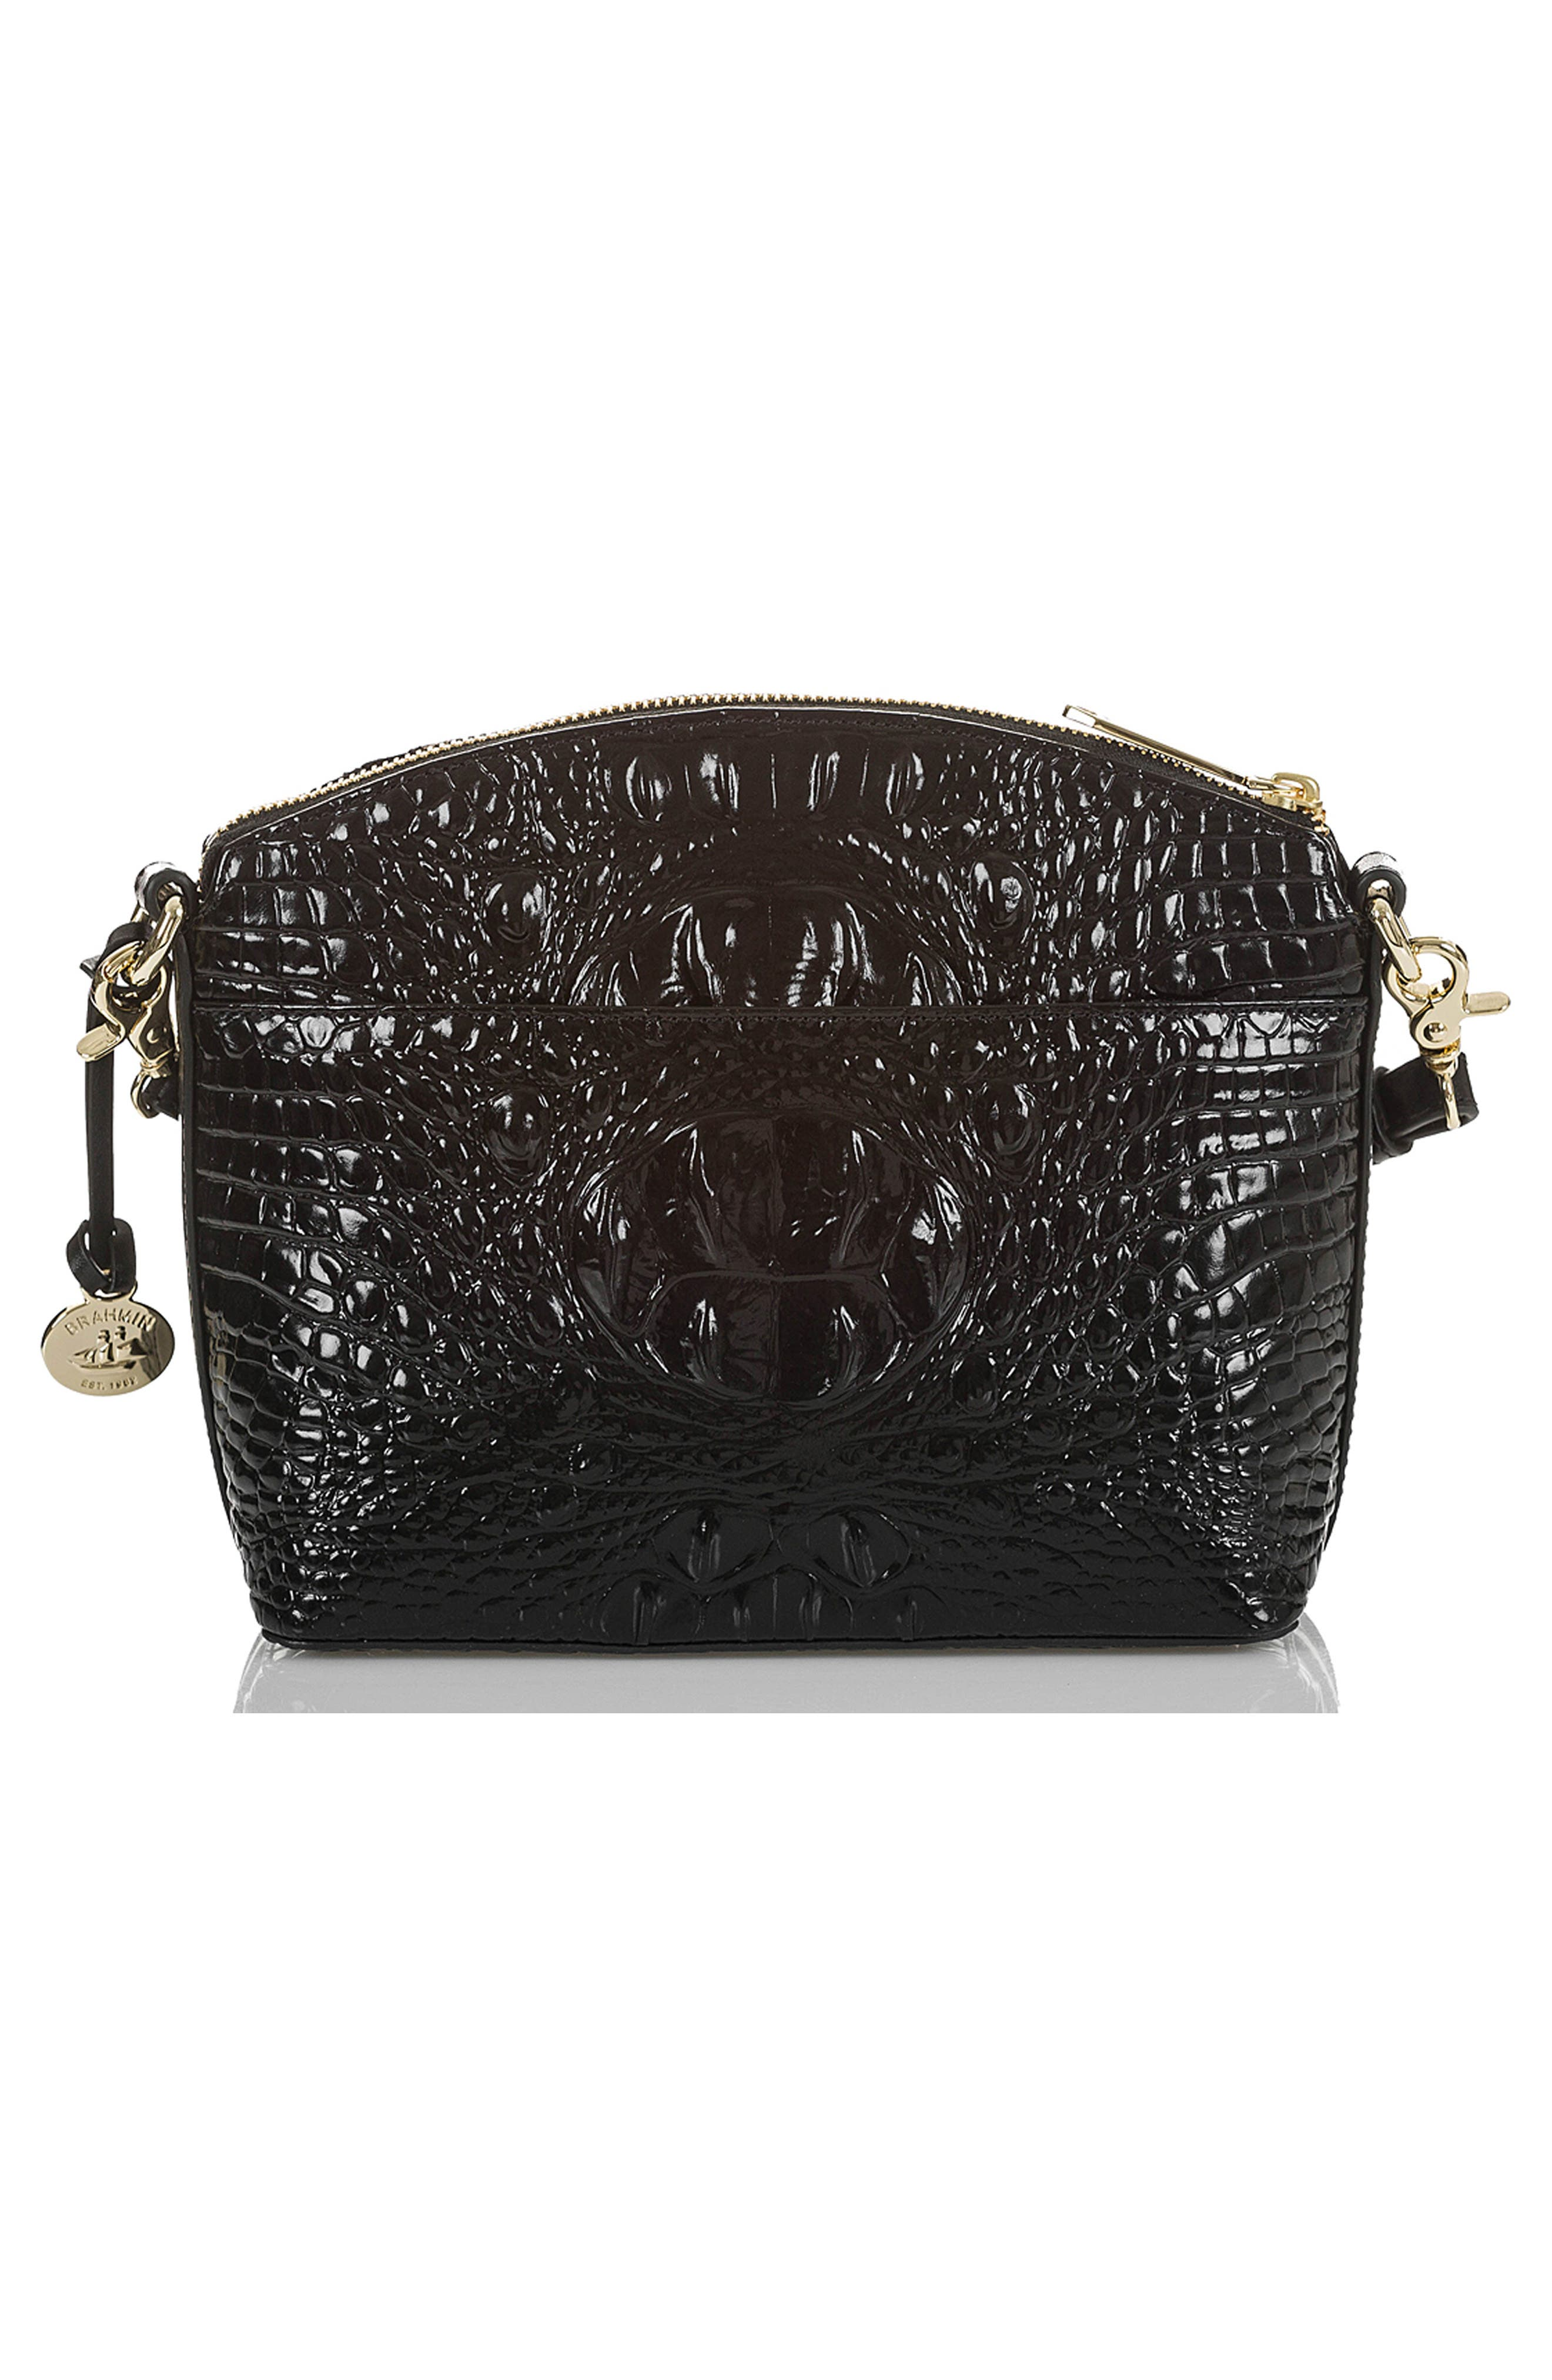 BRAHMIN, Mini Duxbury Embossed Leather Crossbody Bag, Alternate thumbnail 2, color, 028